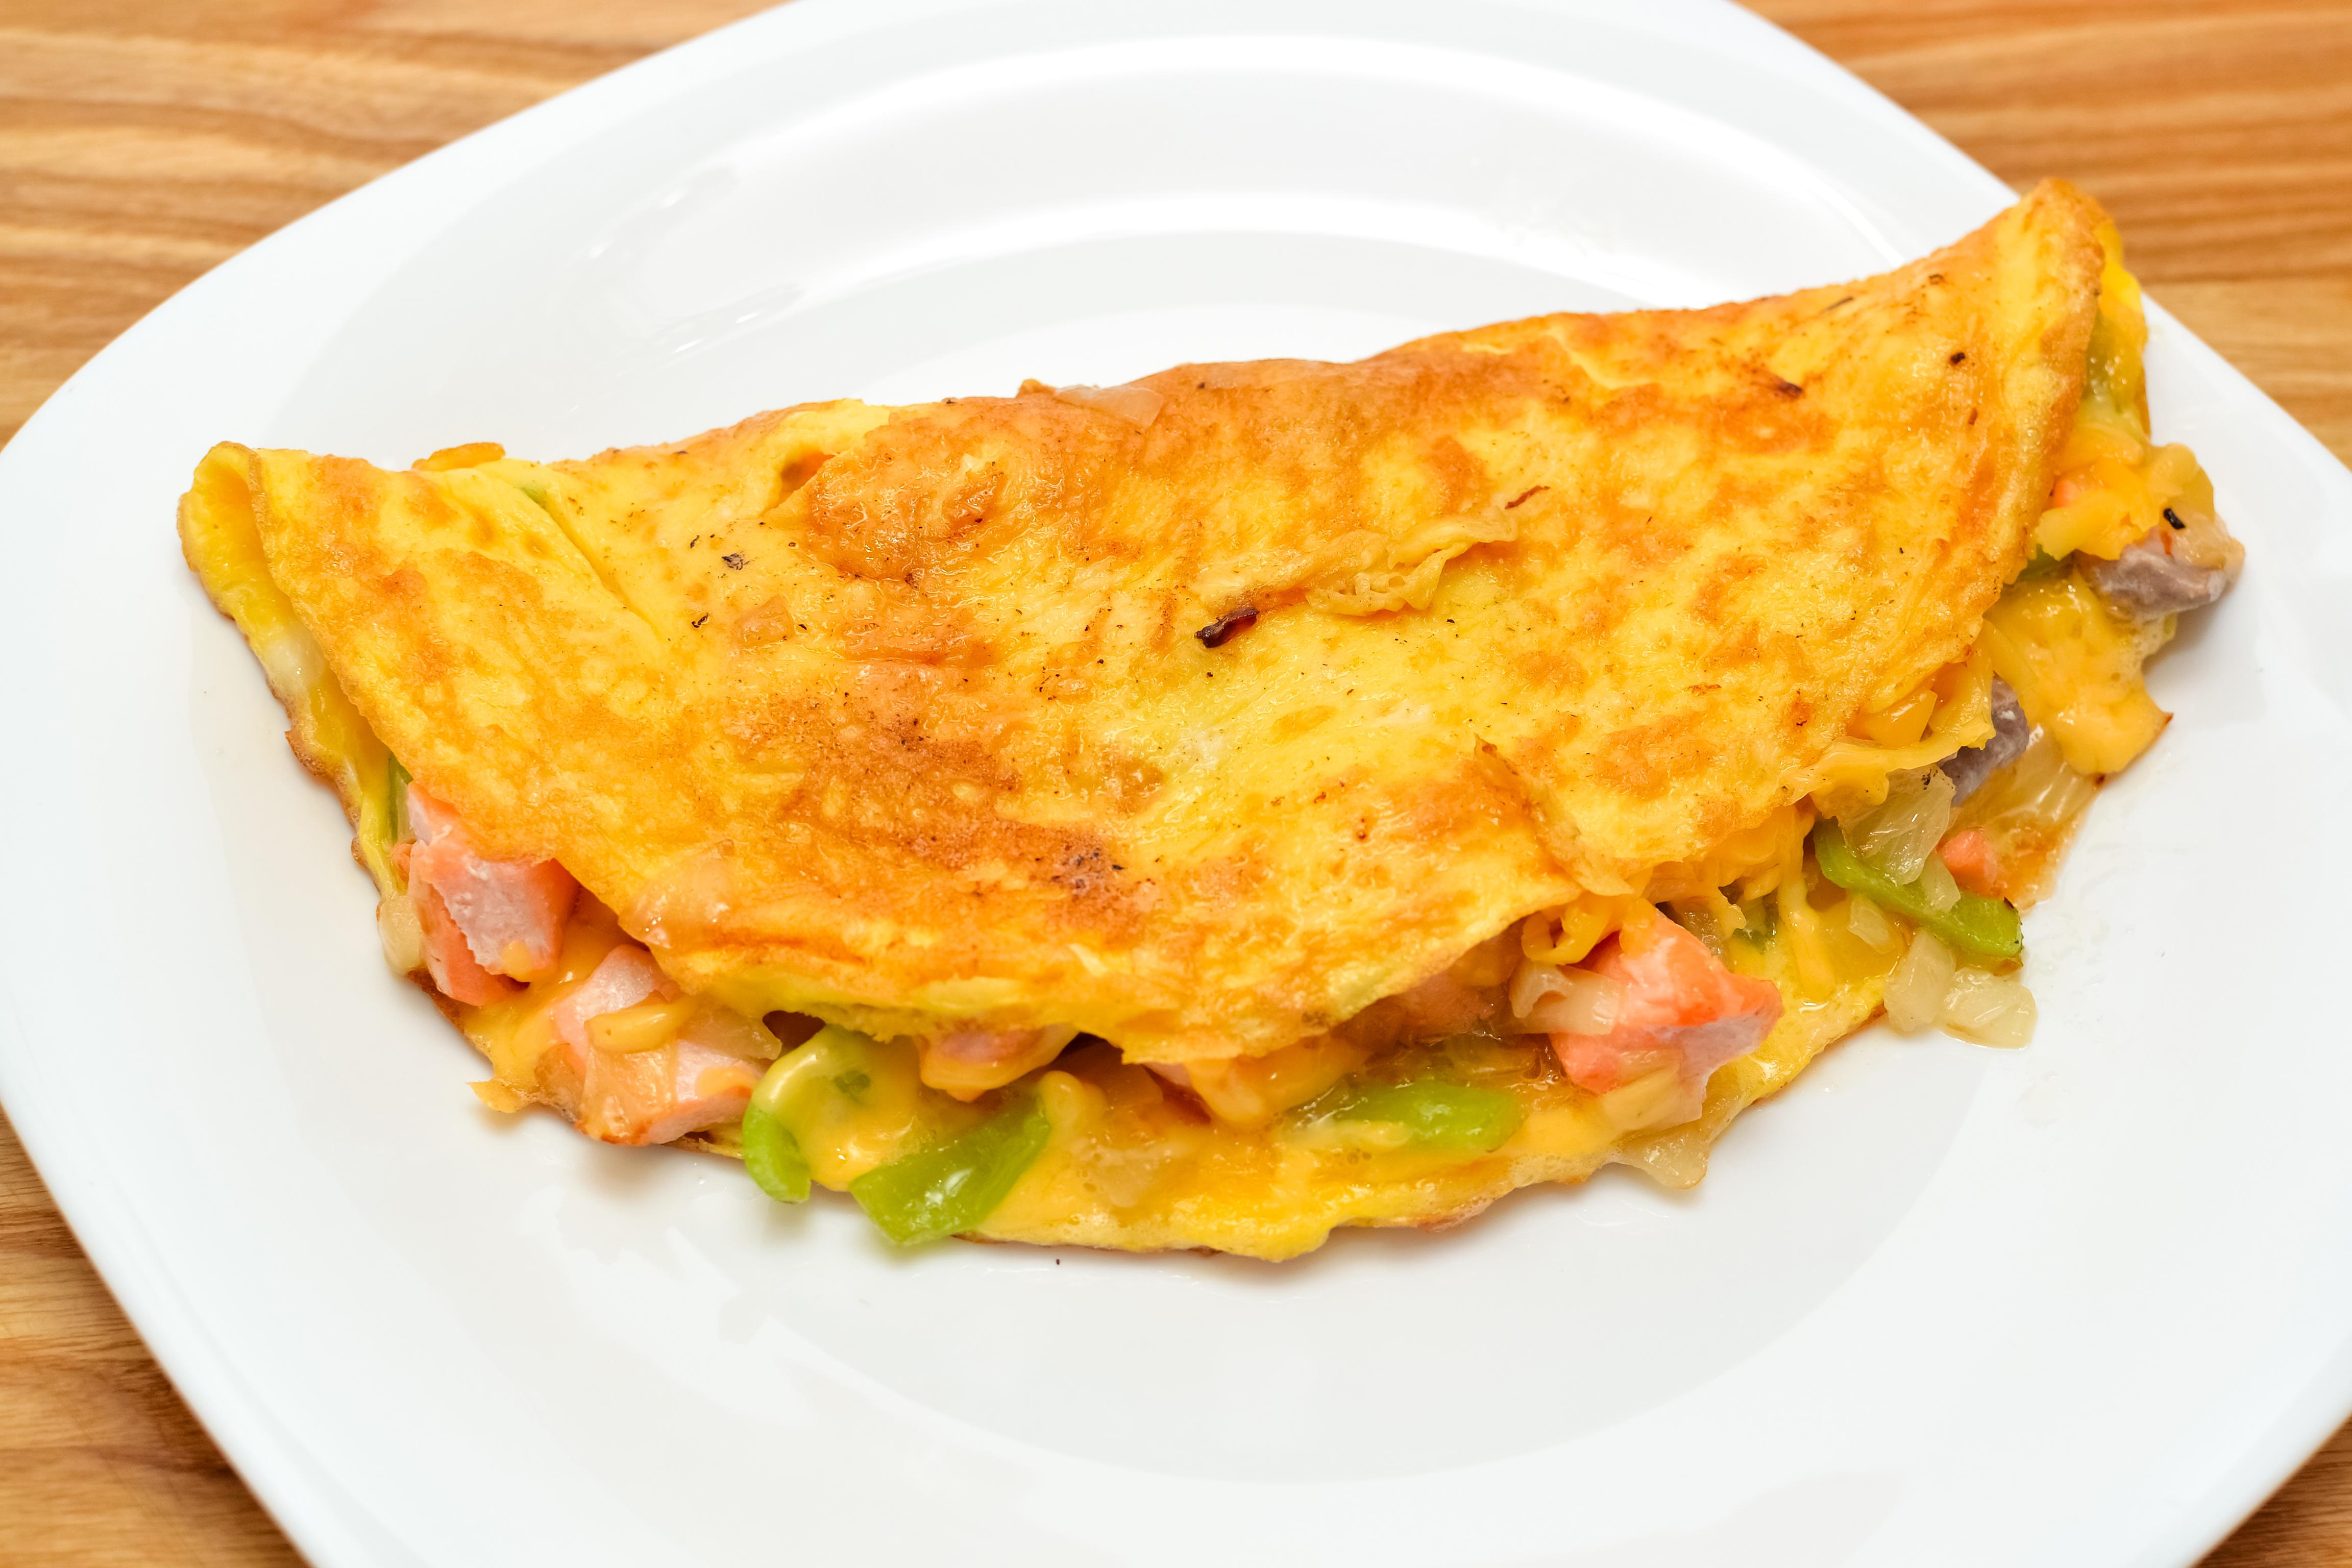 HQ Omelette Wallpapers | File 7191.99Kb